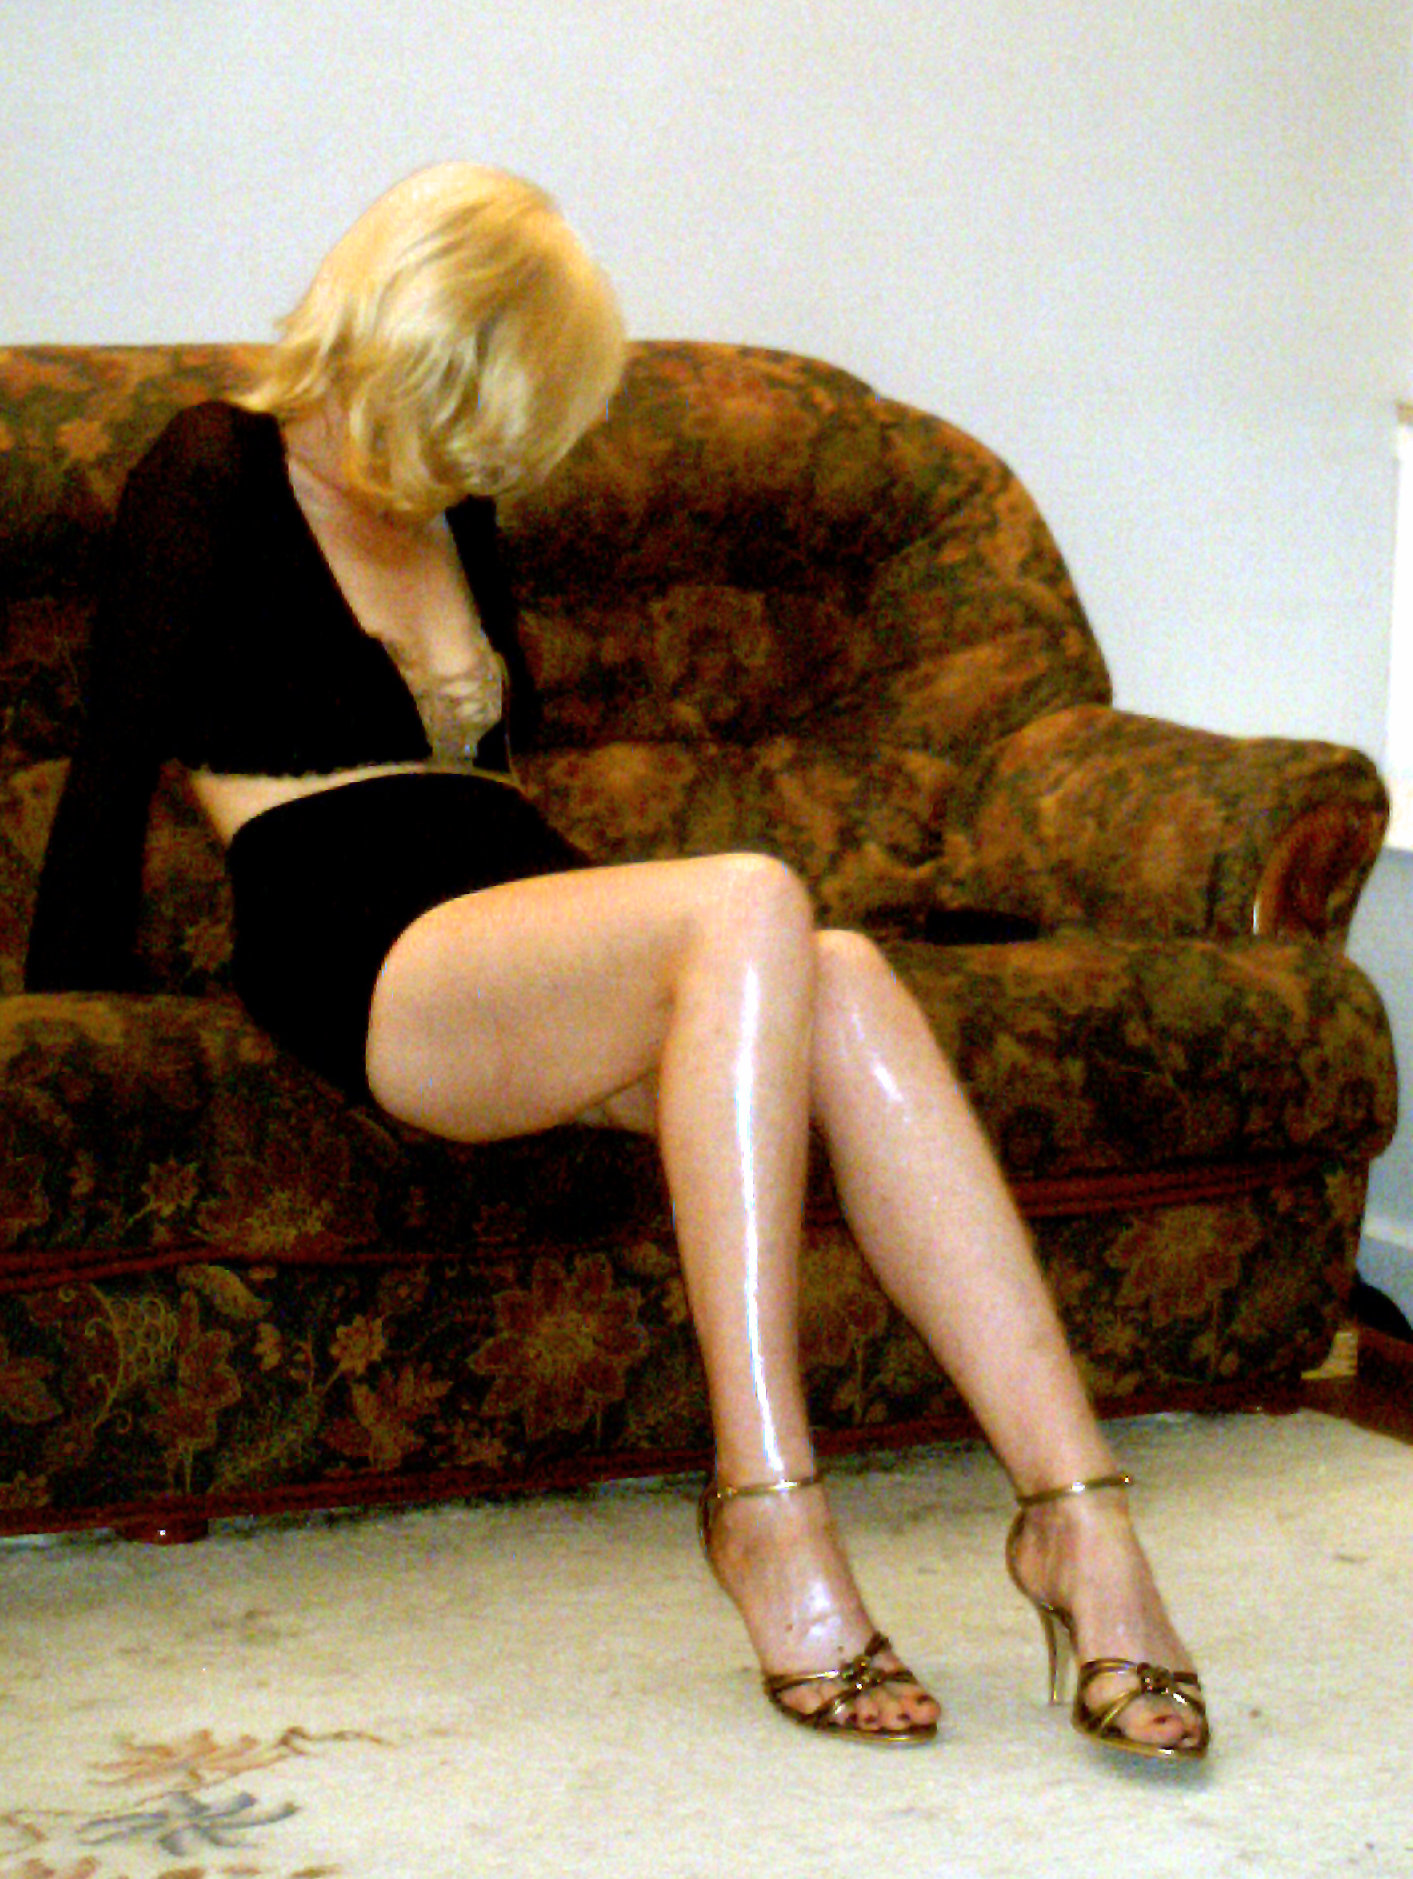 Uk Blonde wife